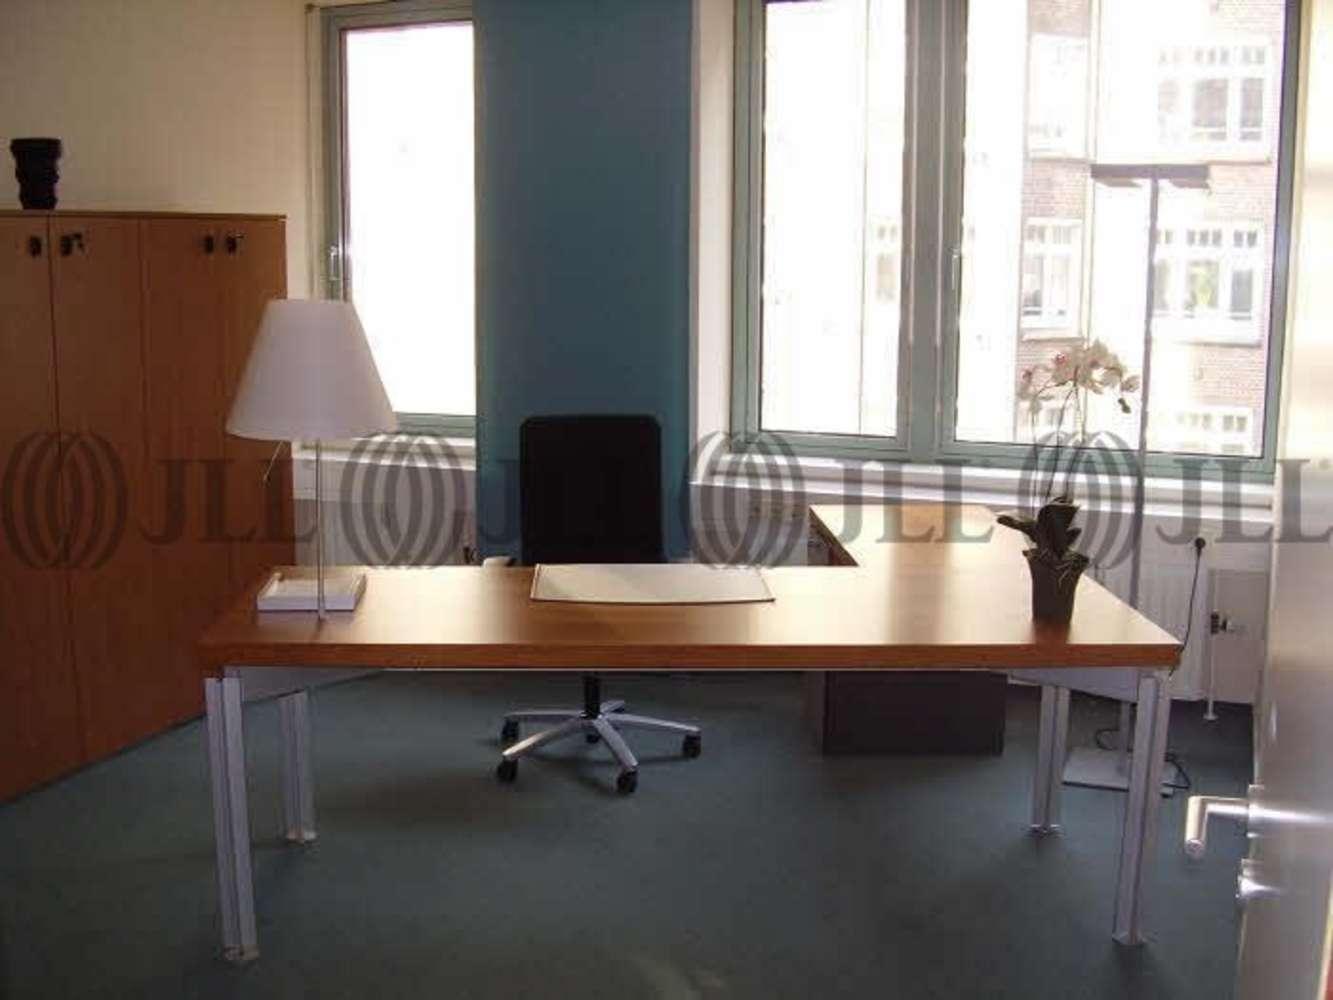 Büros Hamburg, 20459 - Büro - Hamburg, Neustadt - H0002 - 9422114